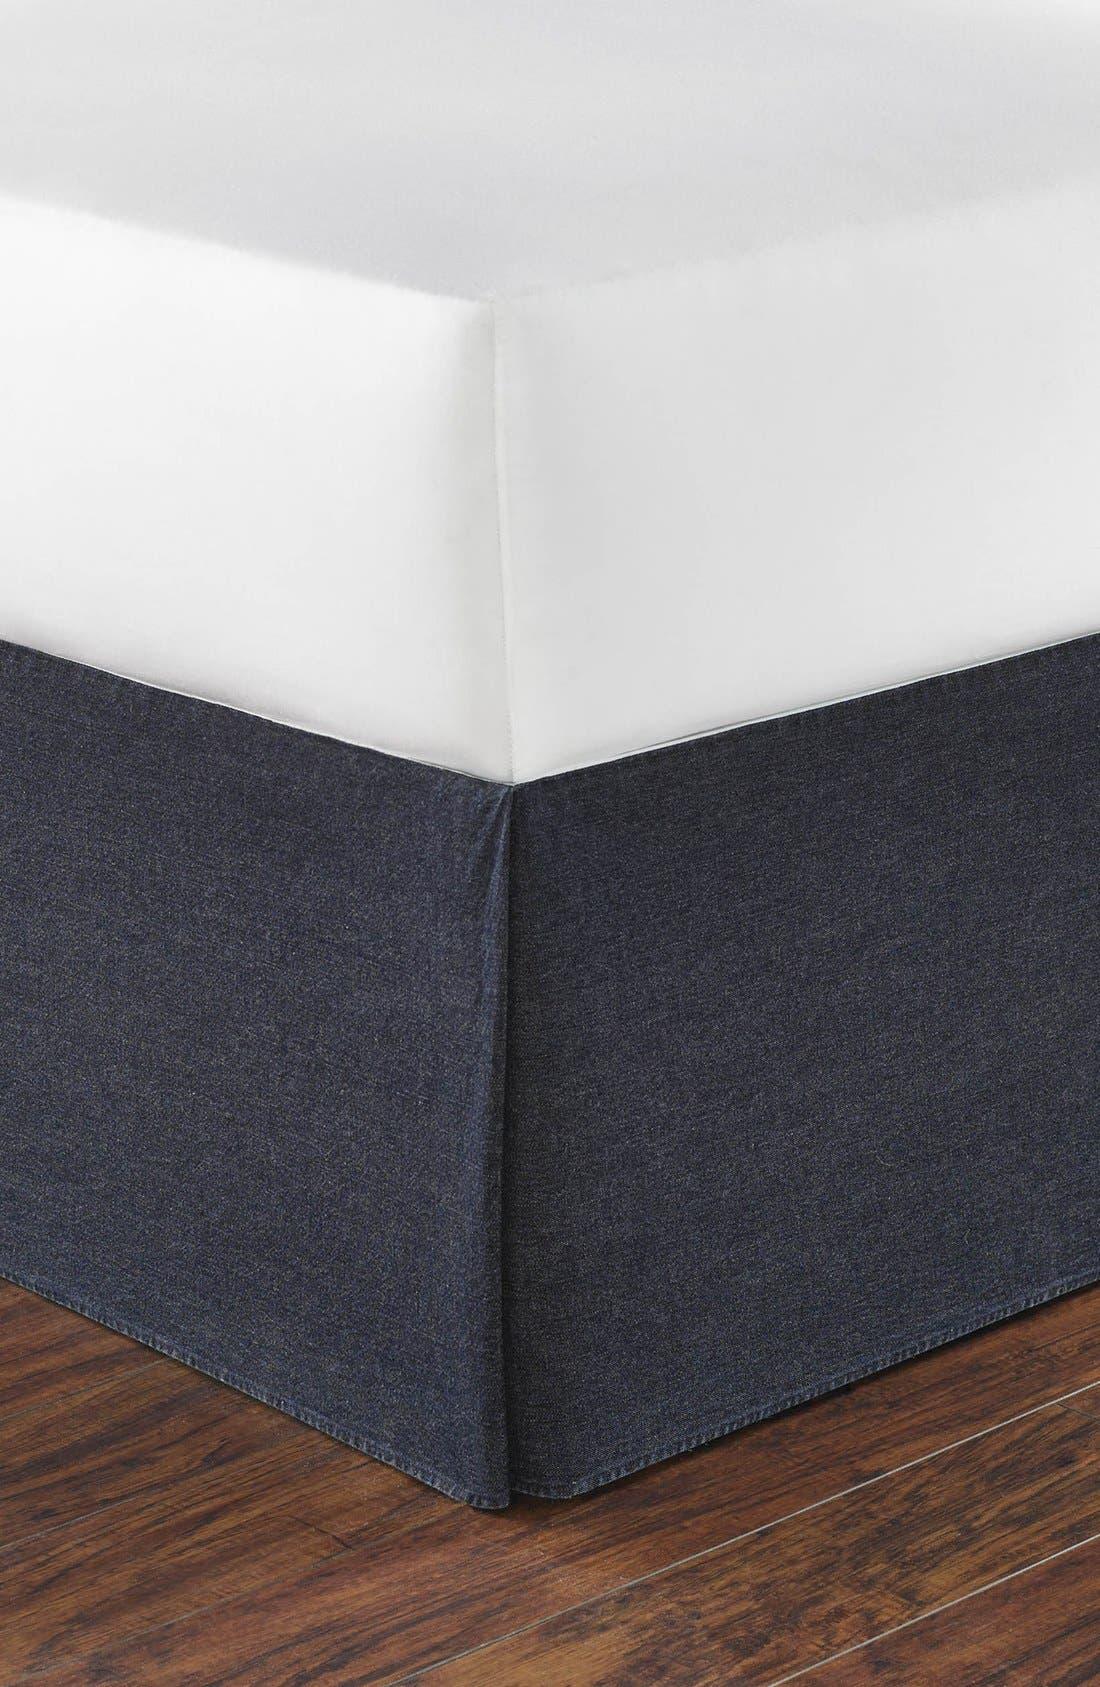 'Seaward' Bed Skirt,                             Main thumbnail 1, color,                             Denim Blue